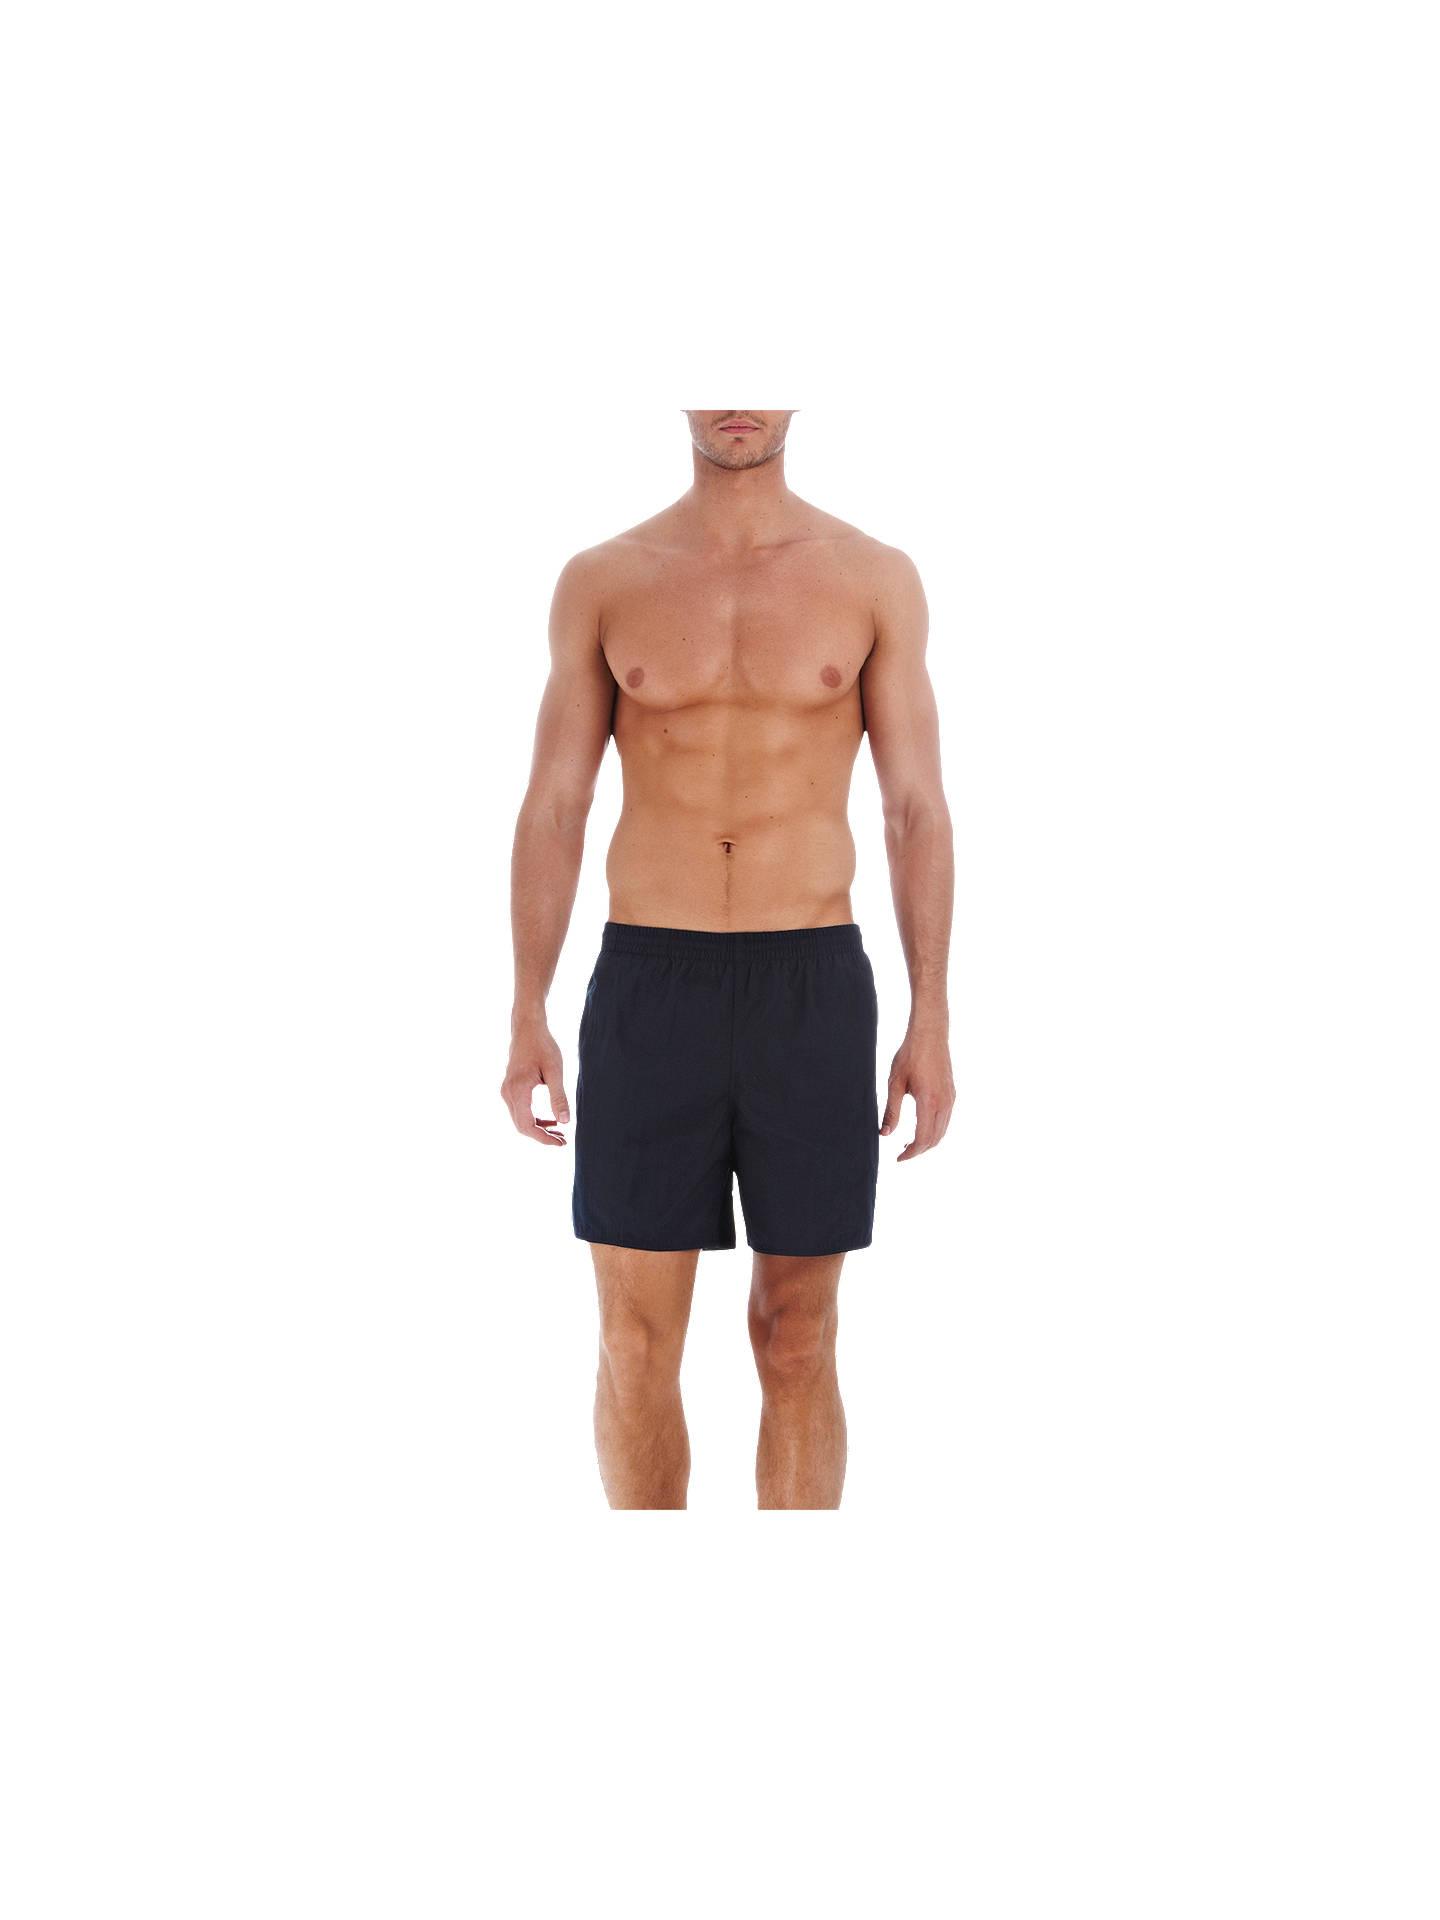 c59e3fab55 Homepage · Men · Men's Swimwear. Previous Image Next Image. Buy Speedo  Solid Leisure 16